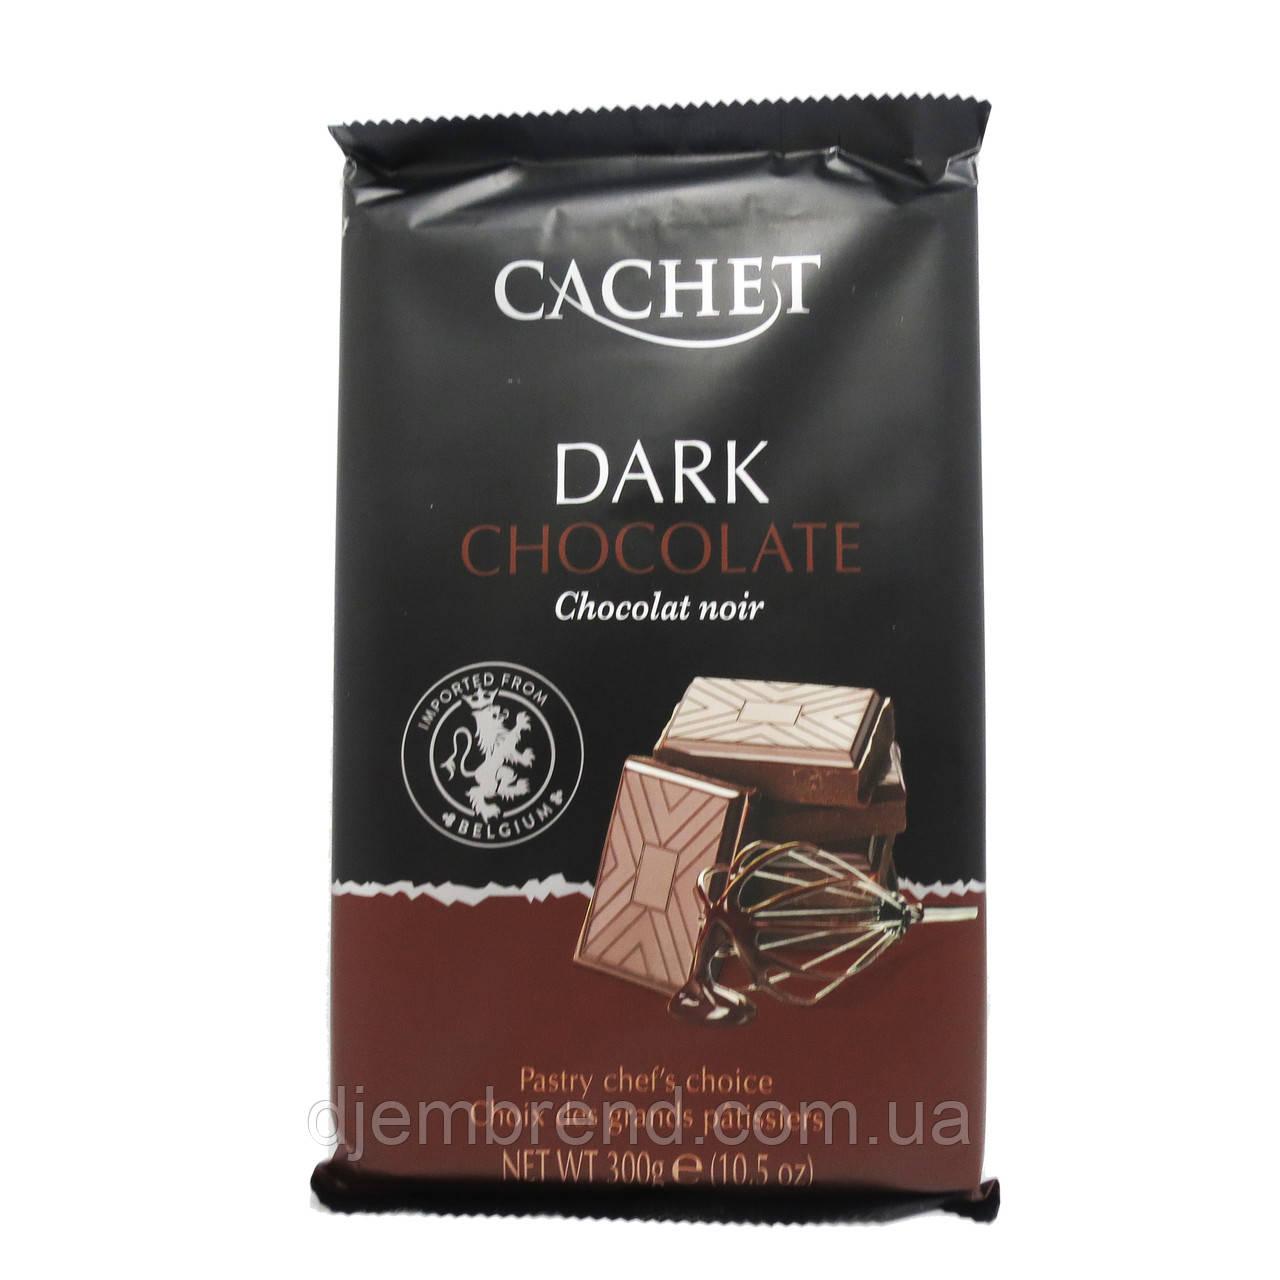 Черный шоколад Cachet , 53%, 300 г